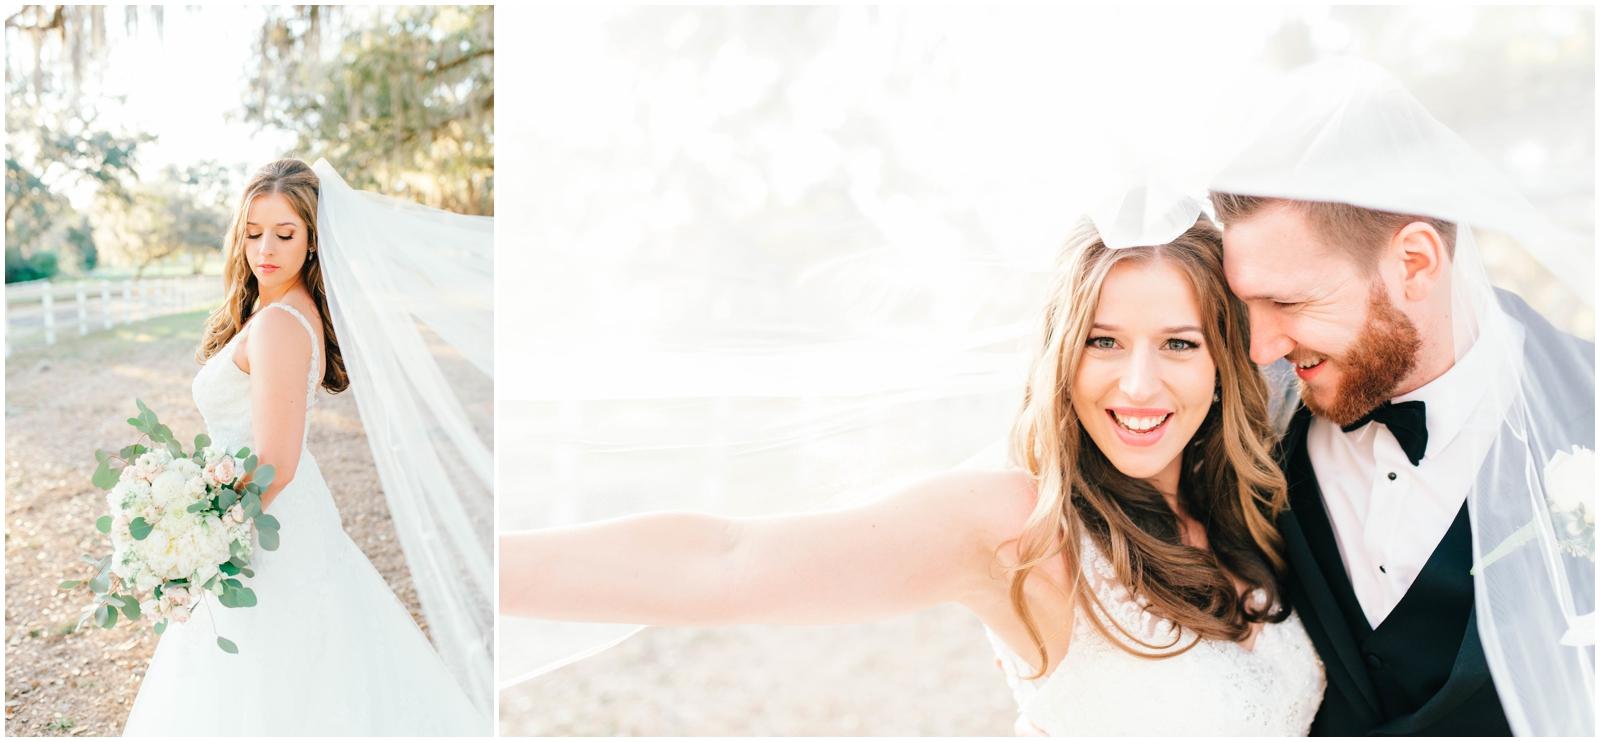 Tampa Area Wedding Venue with Southern Charm- Stonebridge Events_0283.jpg